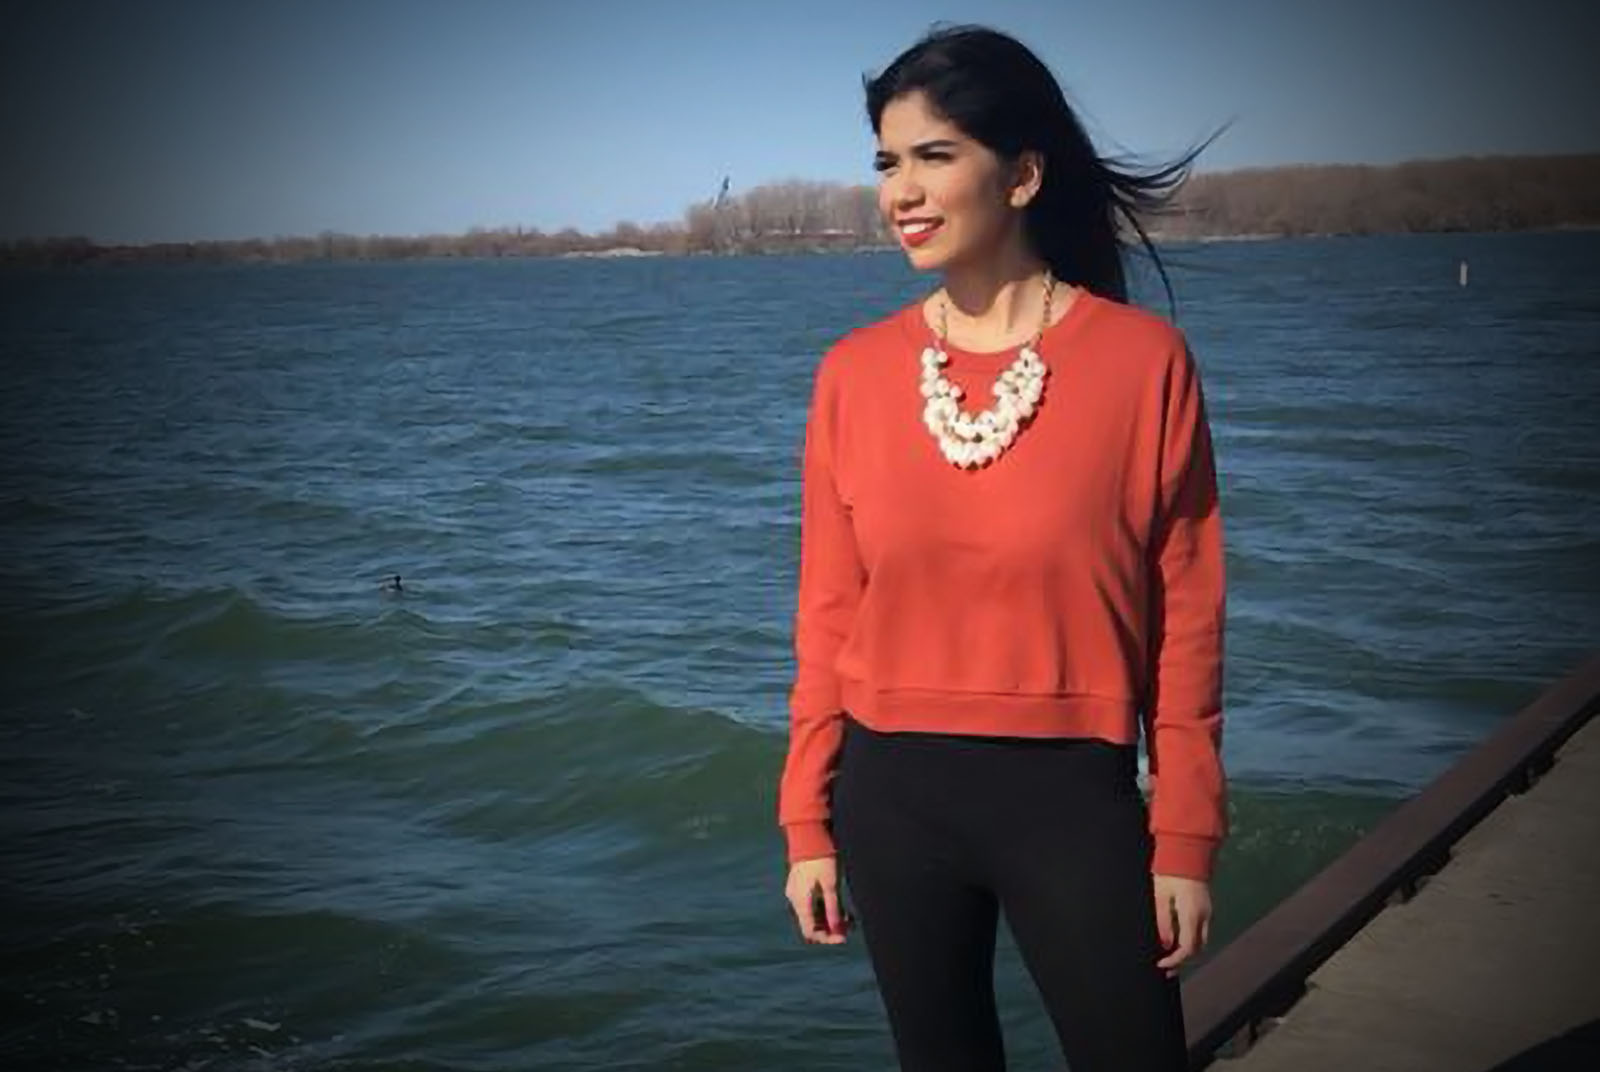 Syeda Abbas CBS Cleveland